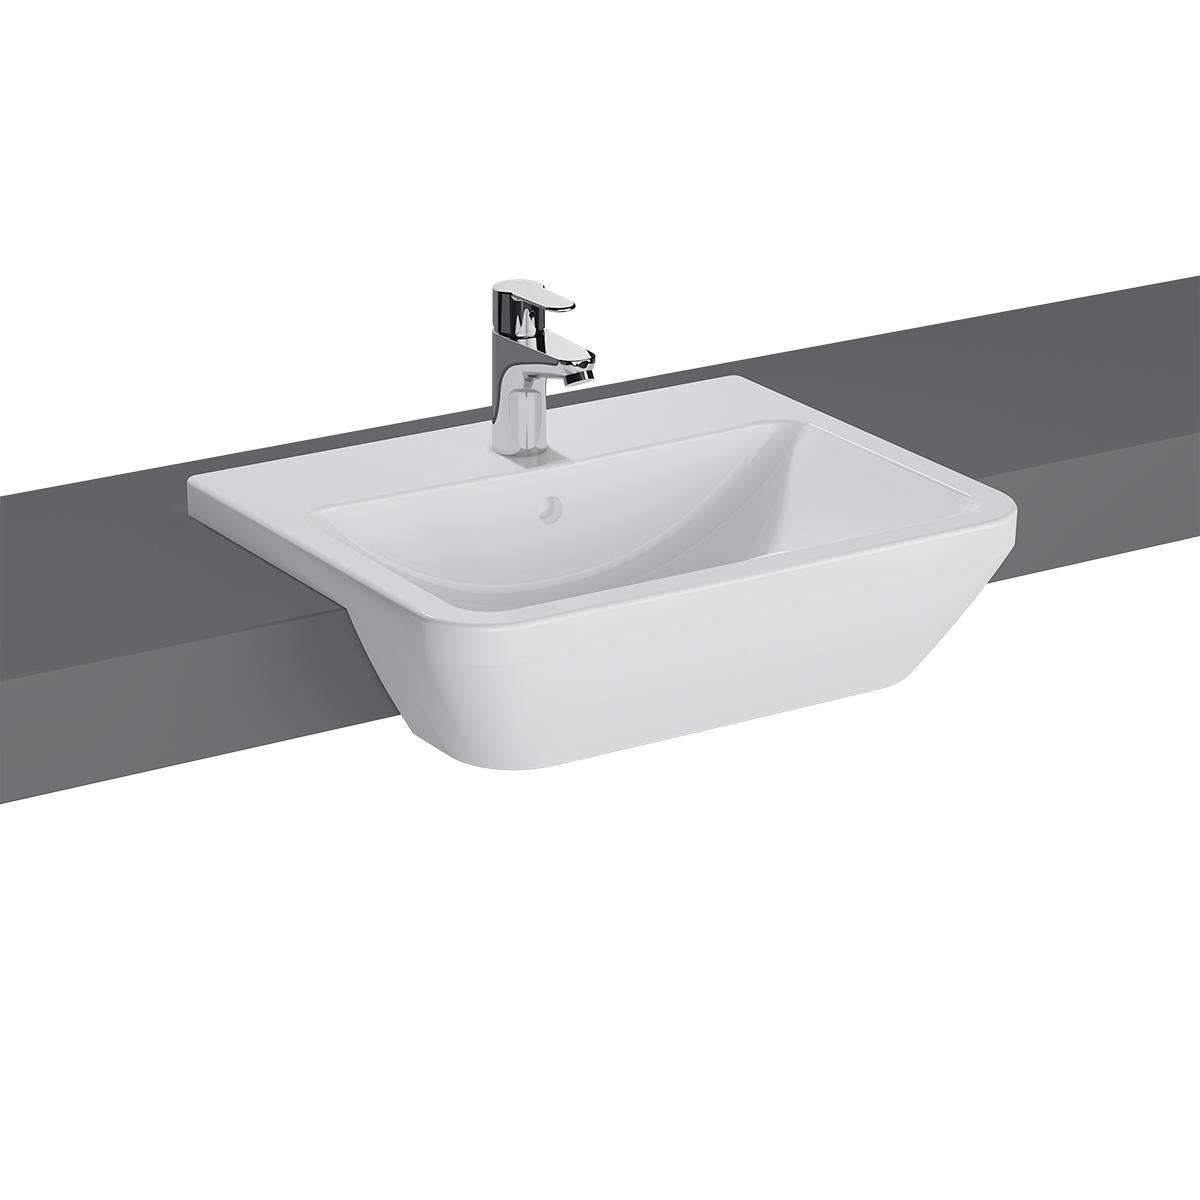 Integra vasque semi-encastrée, 55 cm